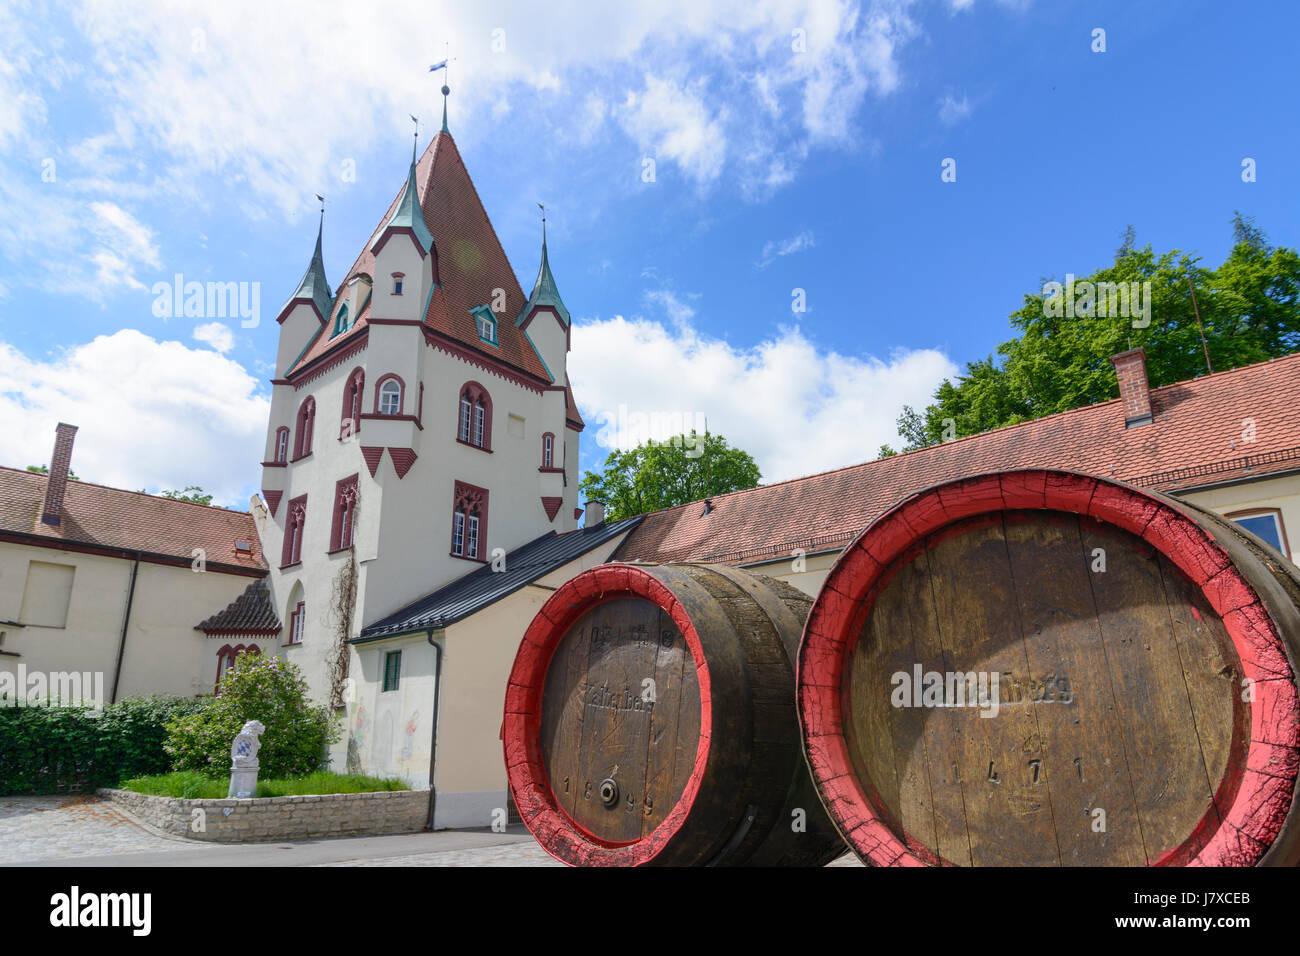 Kaltenberg Castle Barrels Of Brewery Geltendorf Oberbayern Upper Bavaria Bayern Bavaria Germany Stock Photo Alamy